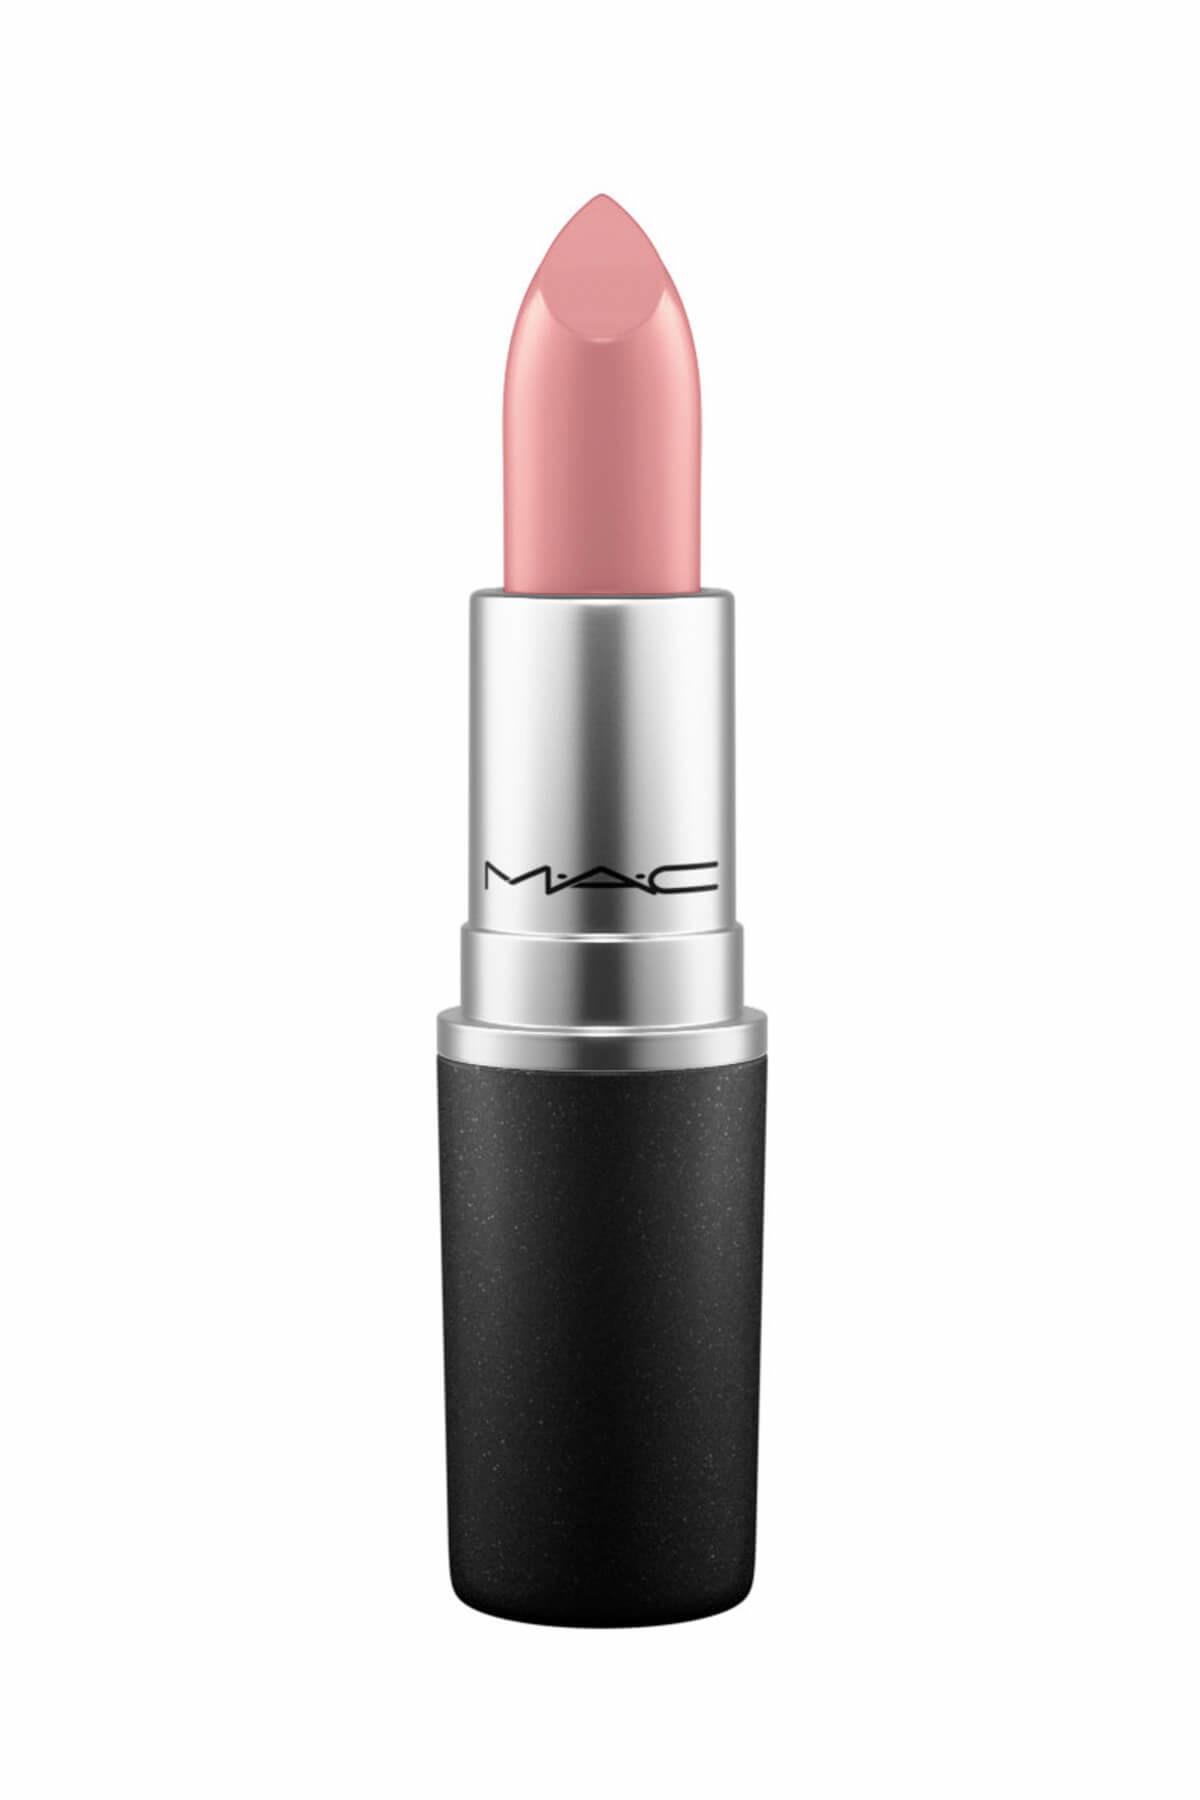 Ruj - Cremesheen Lipstick Modesty 3 g 773602164189